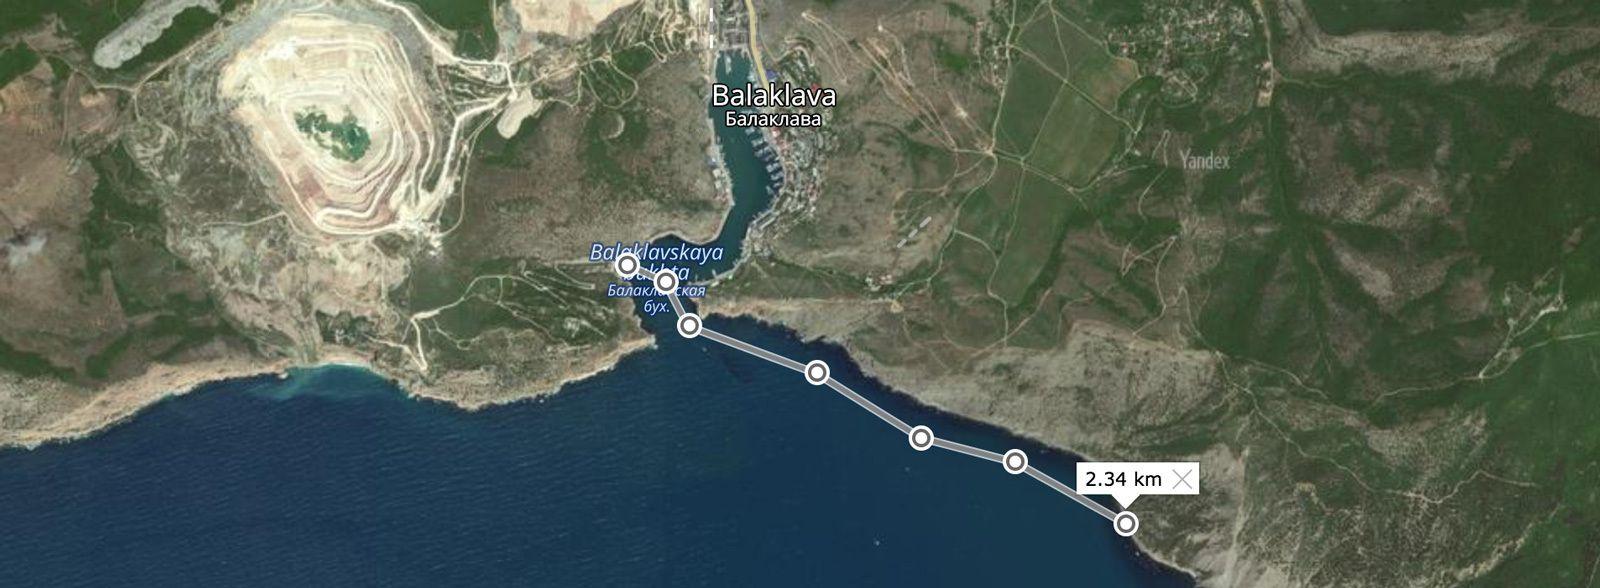 julia-karpacheva-paddleboarding-russia-black-sea-paddle-gps-map-route-3